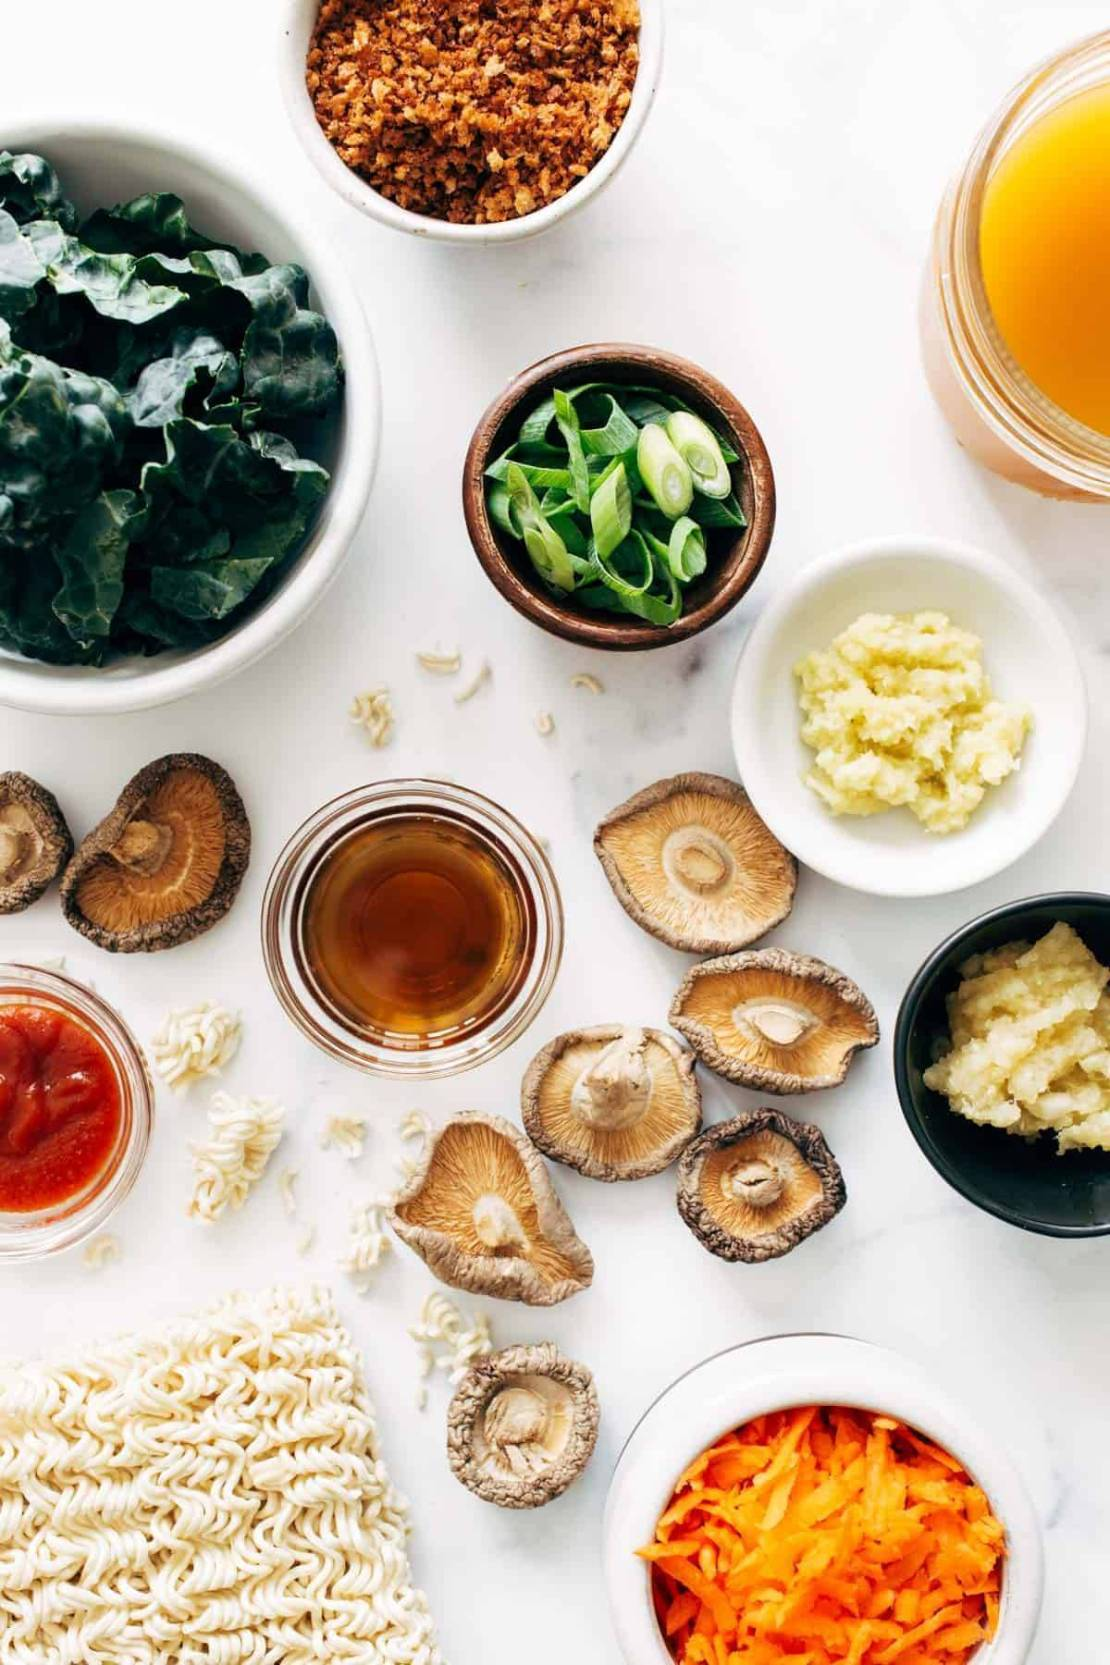 Ingredients for Quick Homemade Ramen